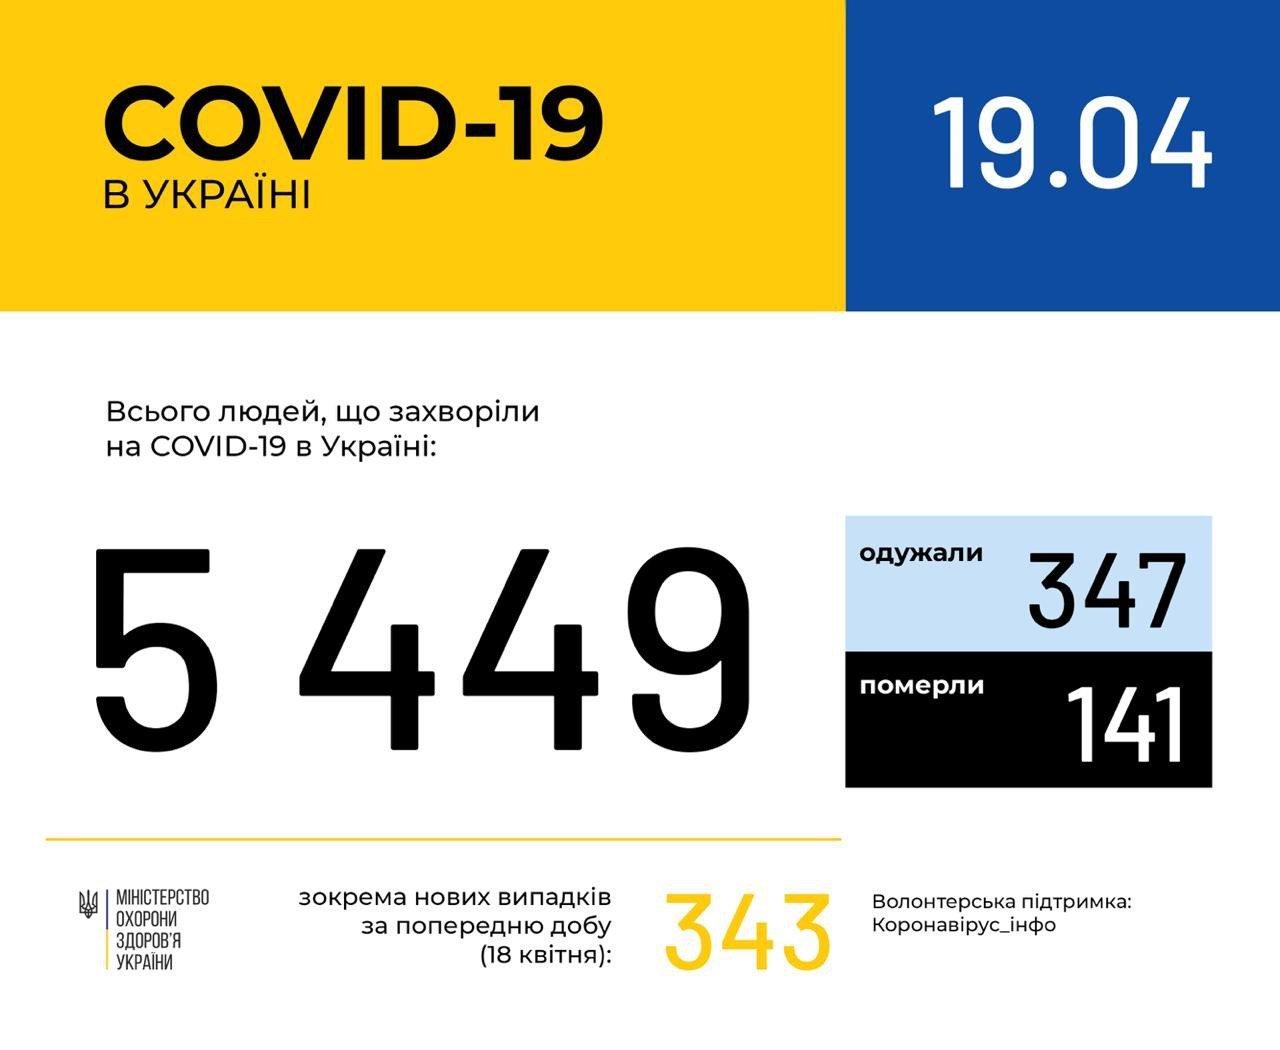 За сутки от коронавируса в Украине умерли 10 человек